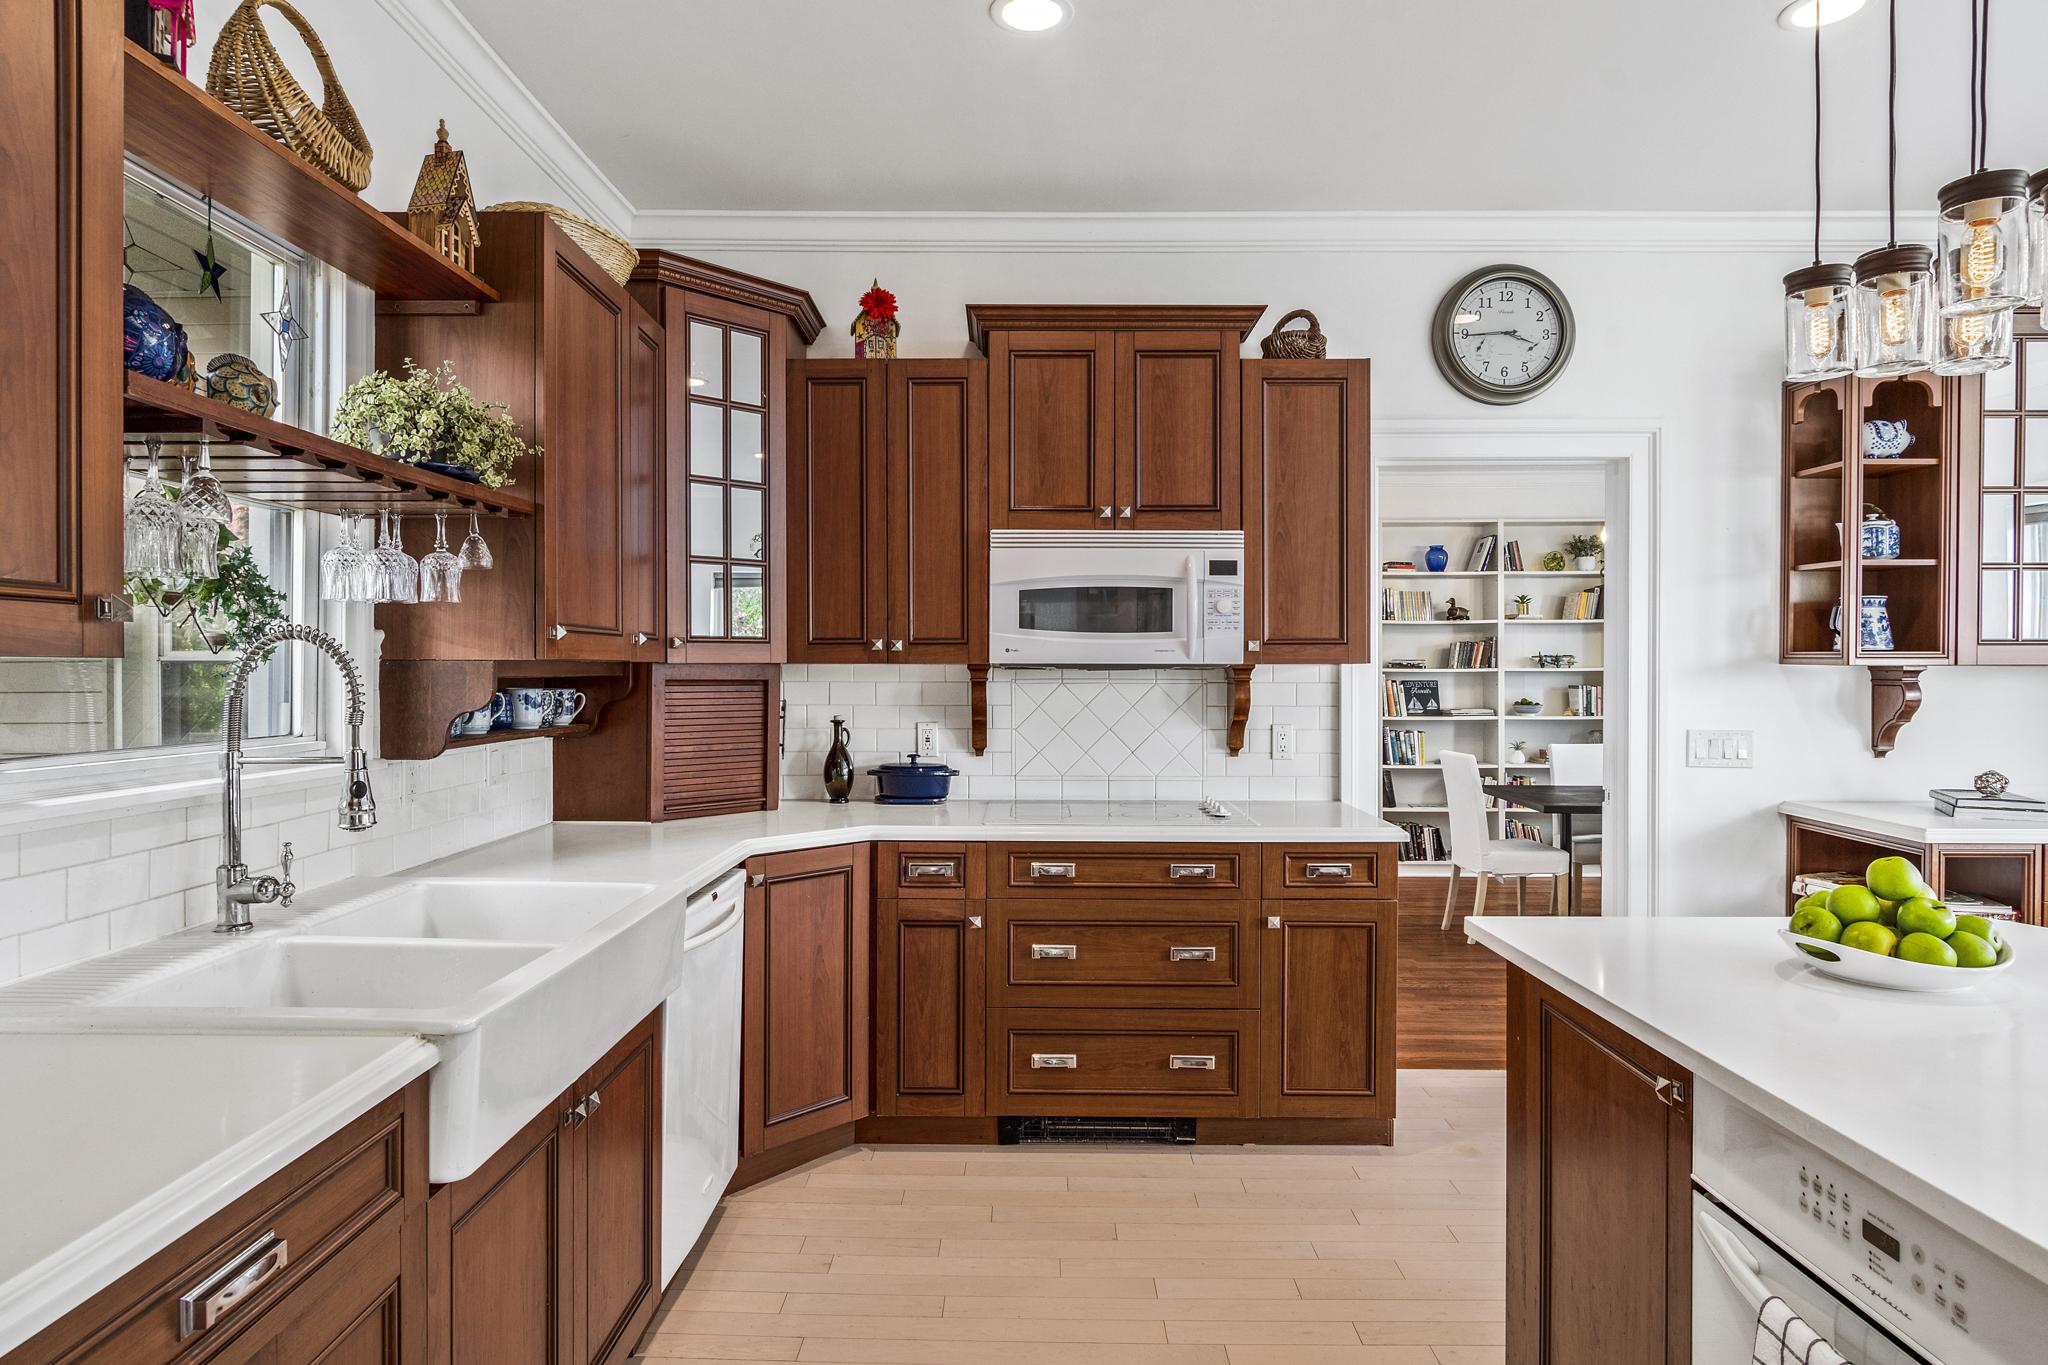 Kitchen_residential_Msparkphoto (1 of 1).jpg